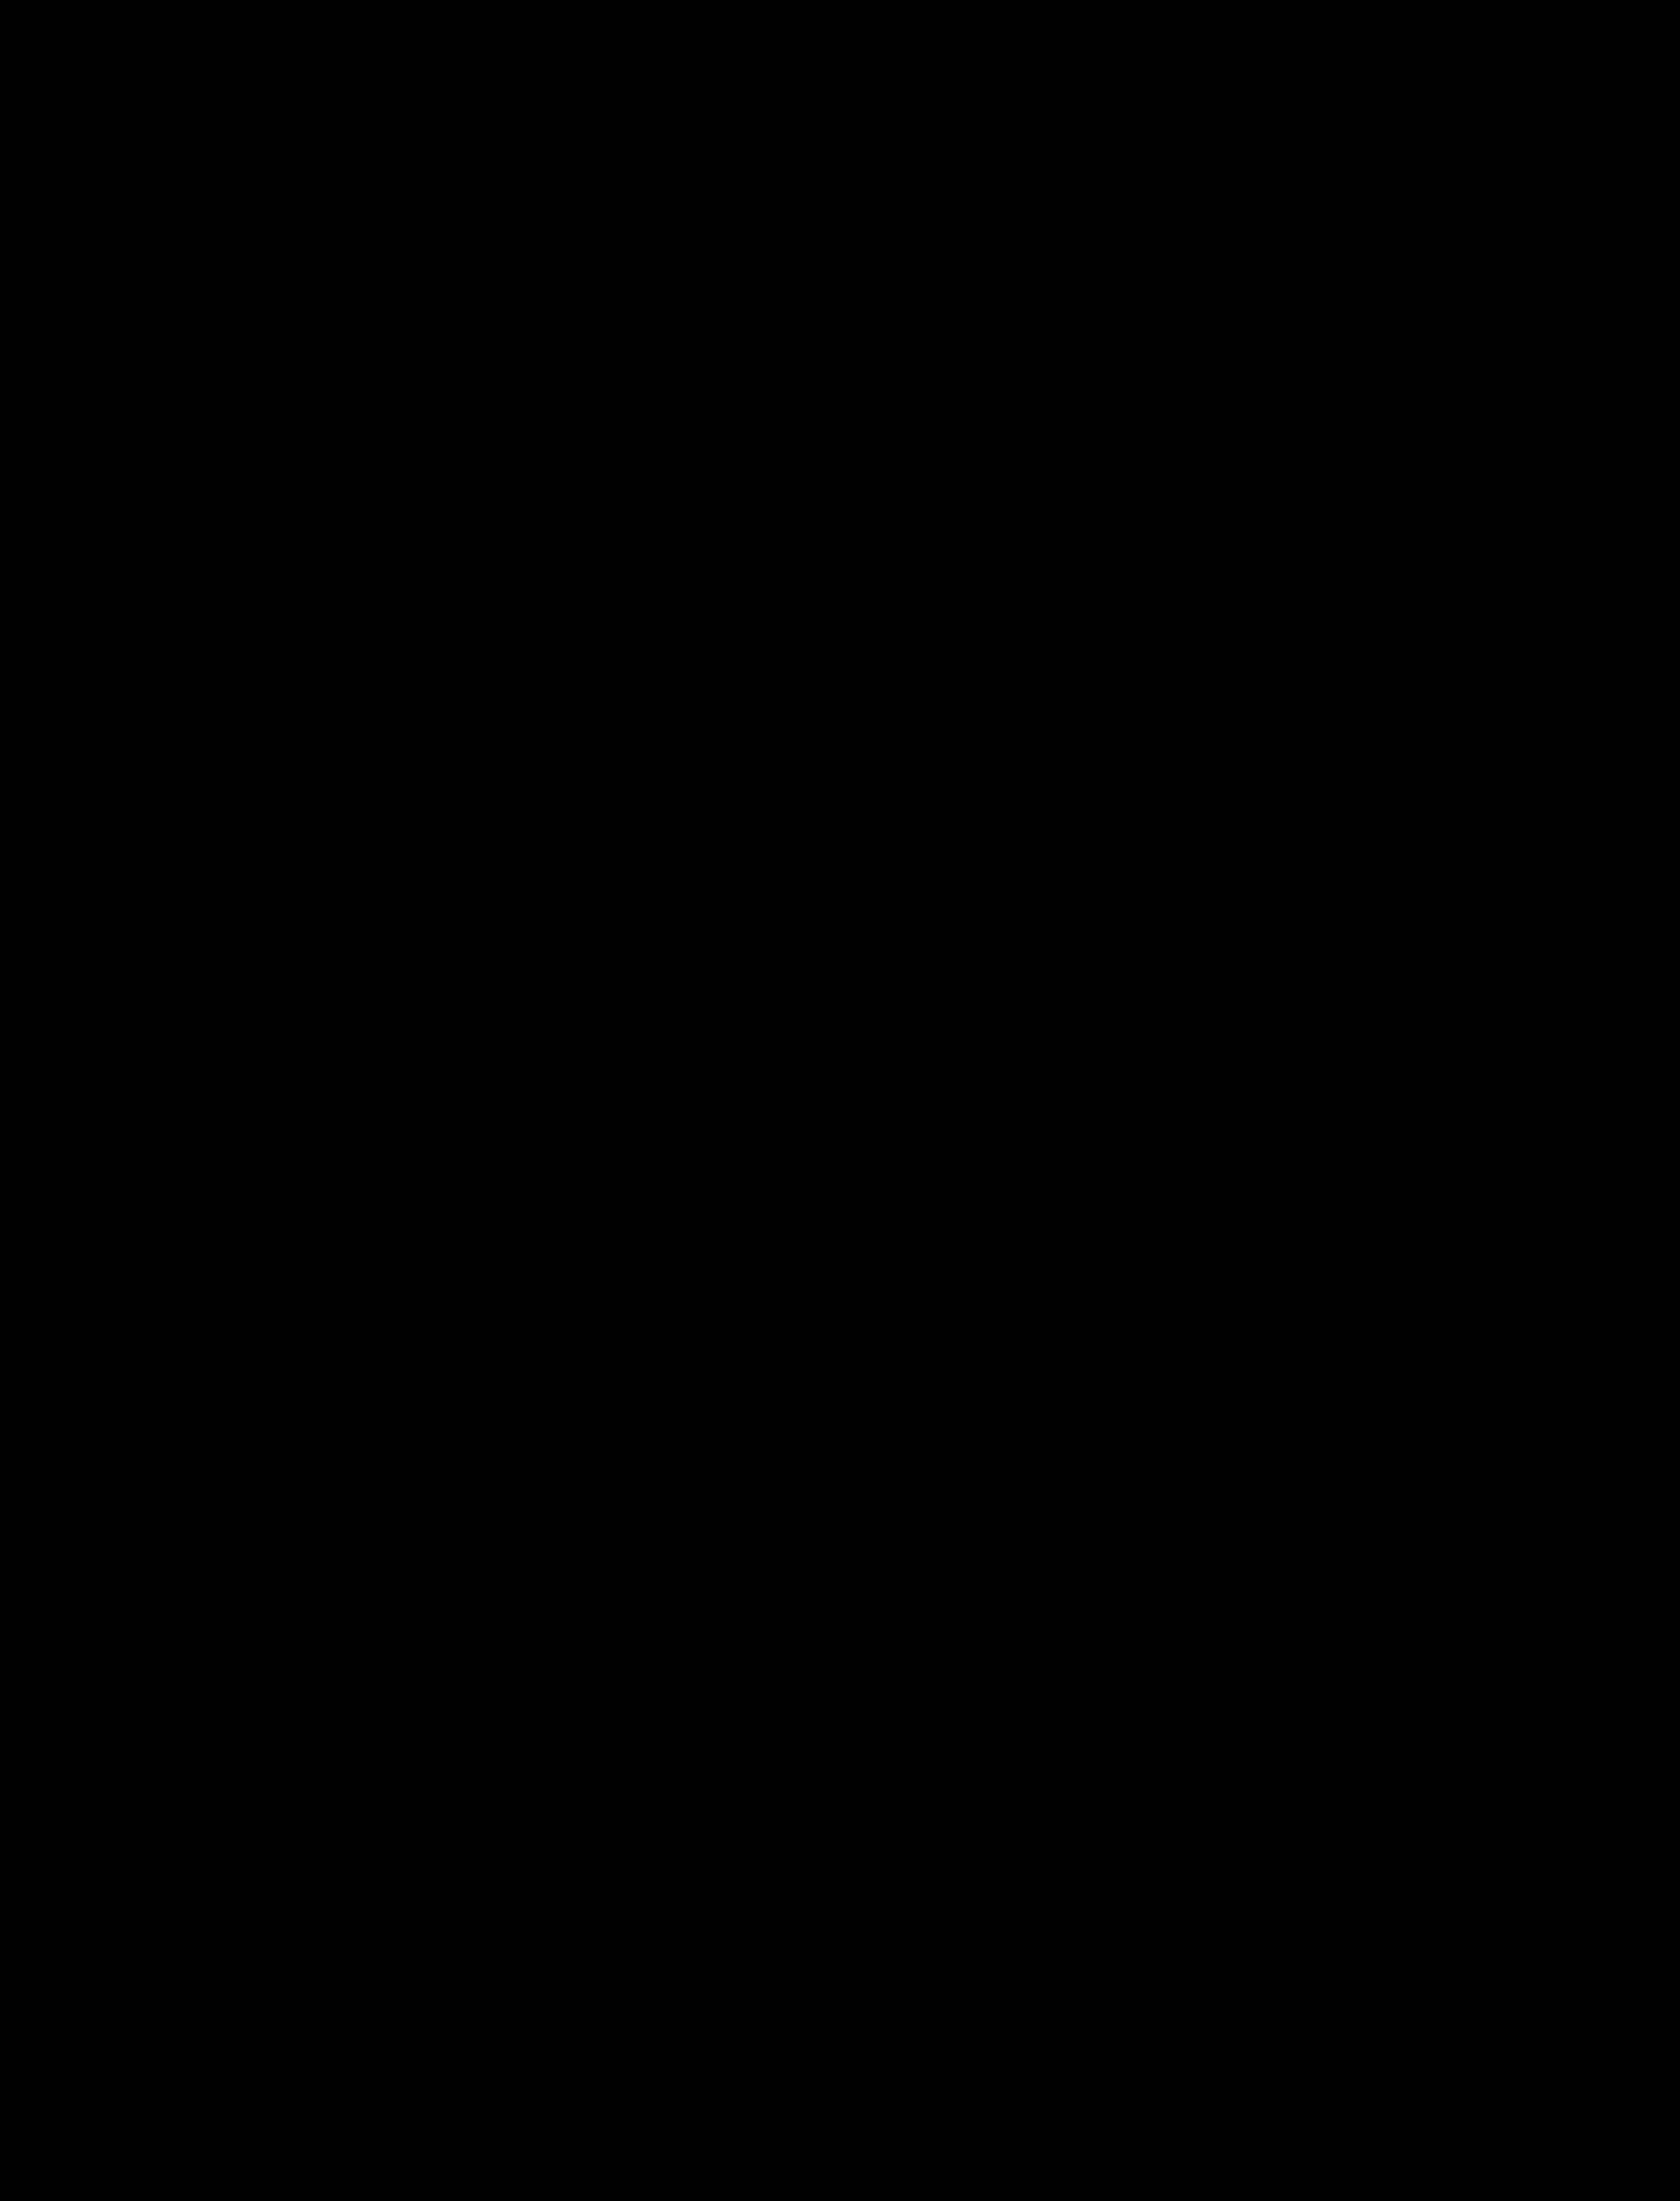 banner transparent download Southen big image png. Cross clipart black